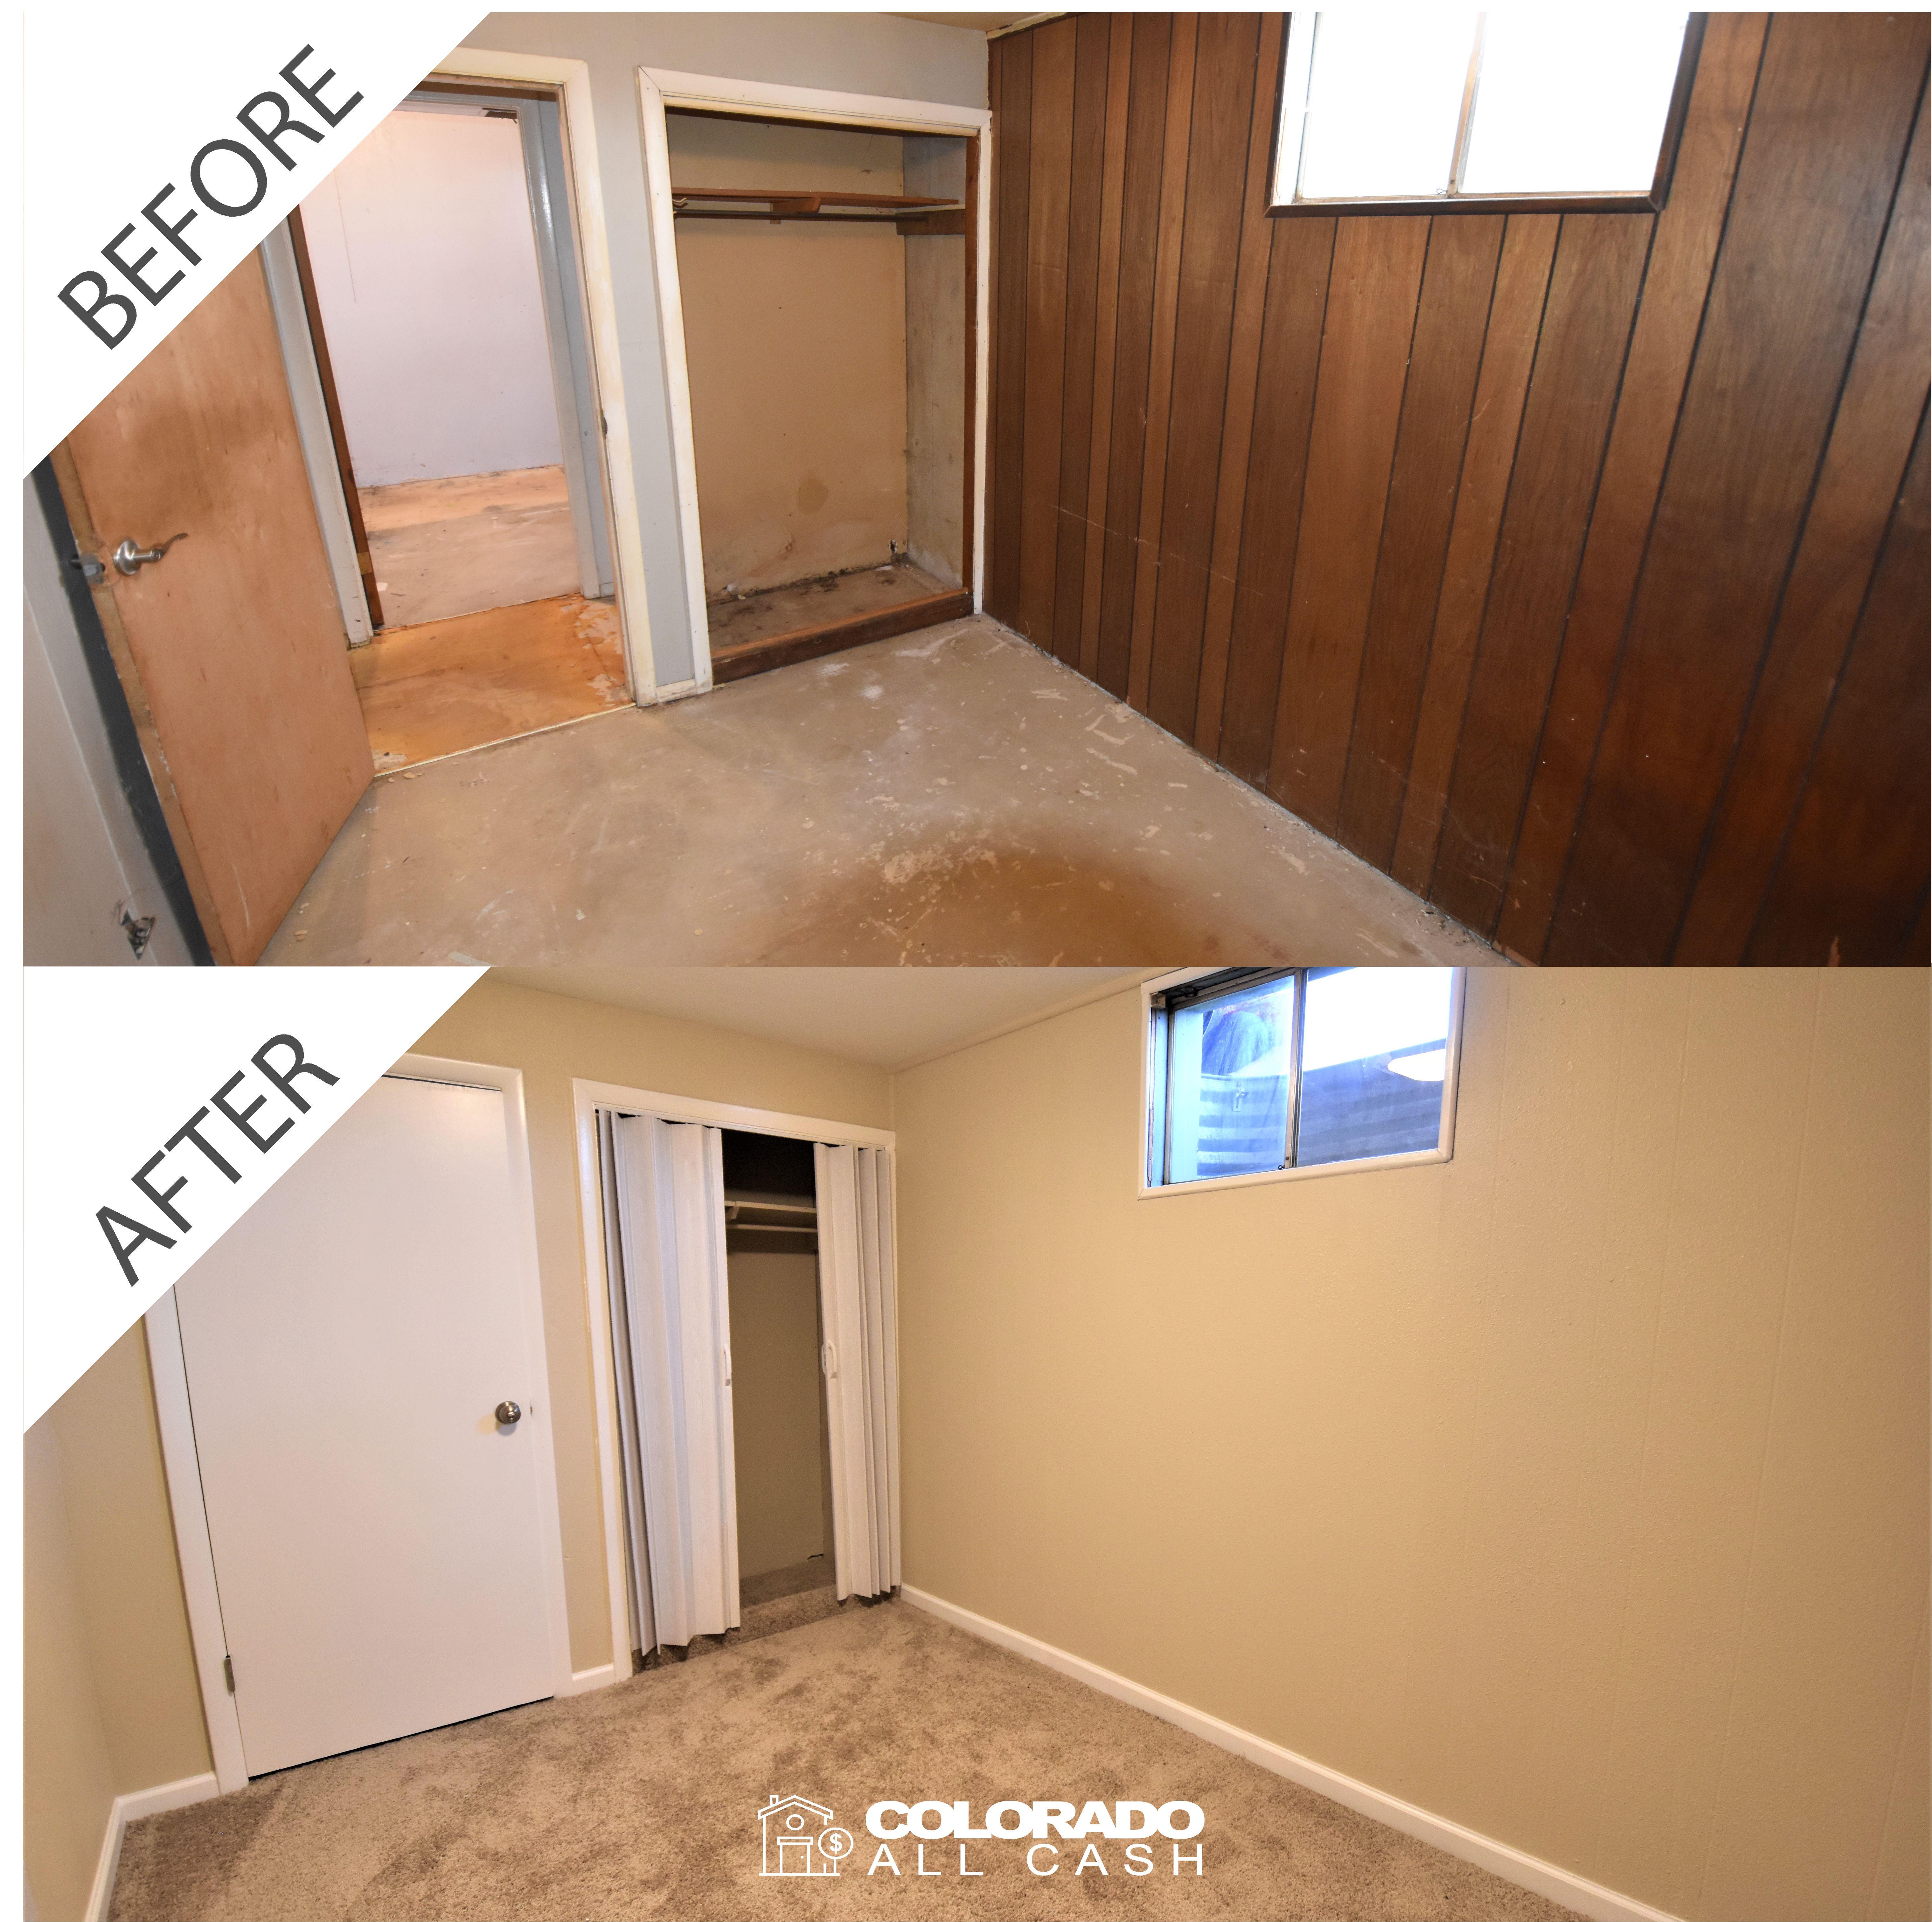 Colorado All Cash Home Renovations Bedroom Remodel Before After Bedroomremodel Bedroomrenovation Bedroommakeover Homemakeover Homerenovation